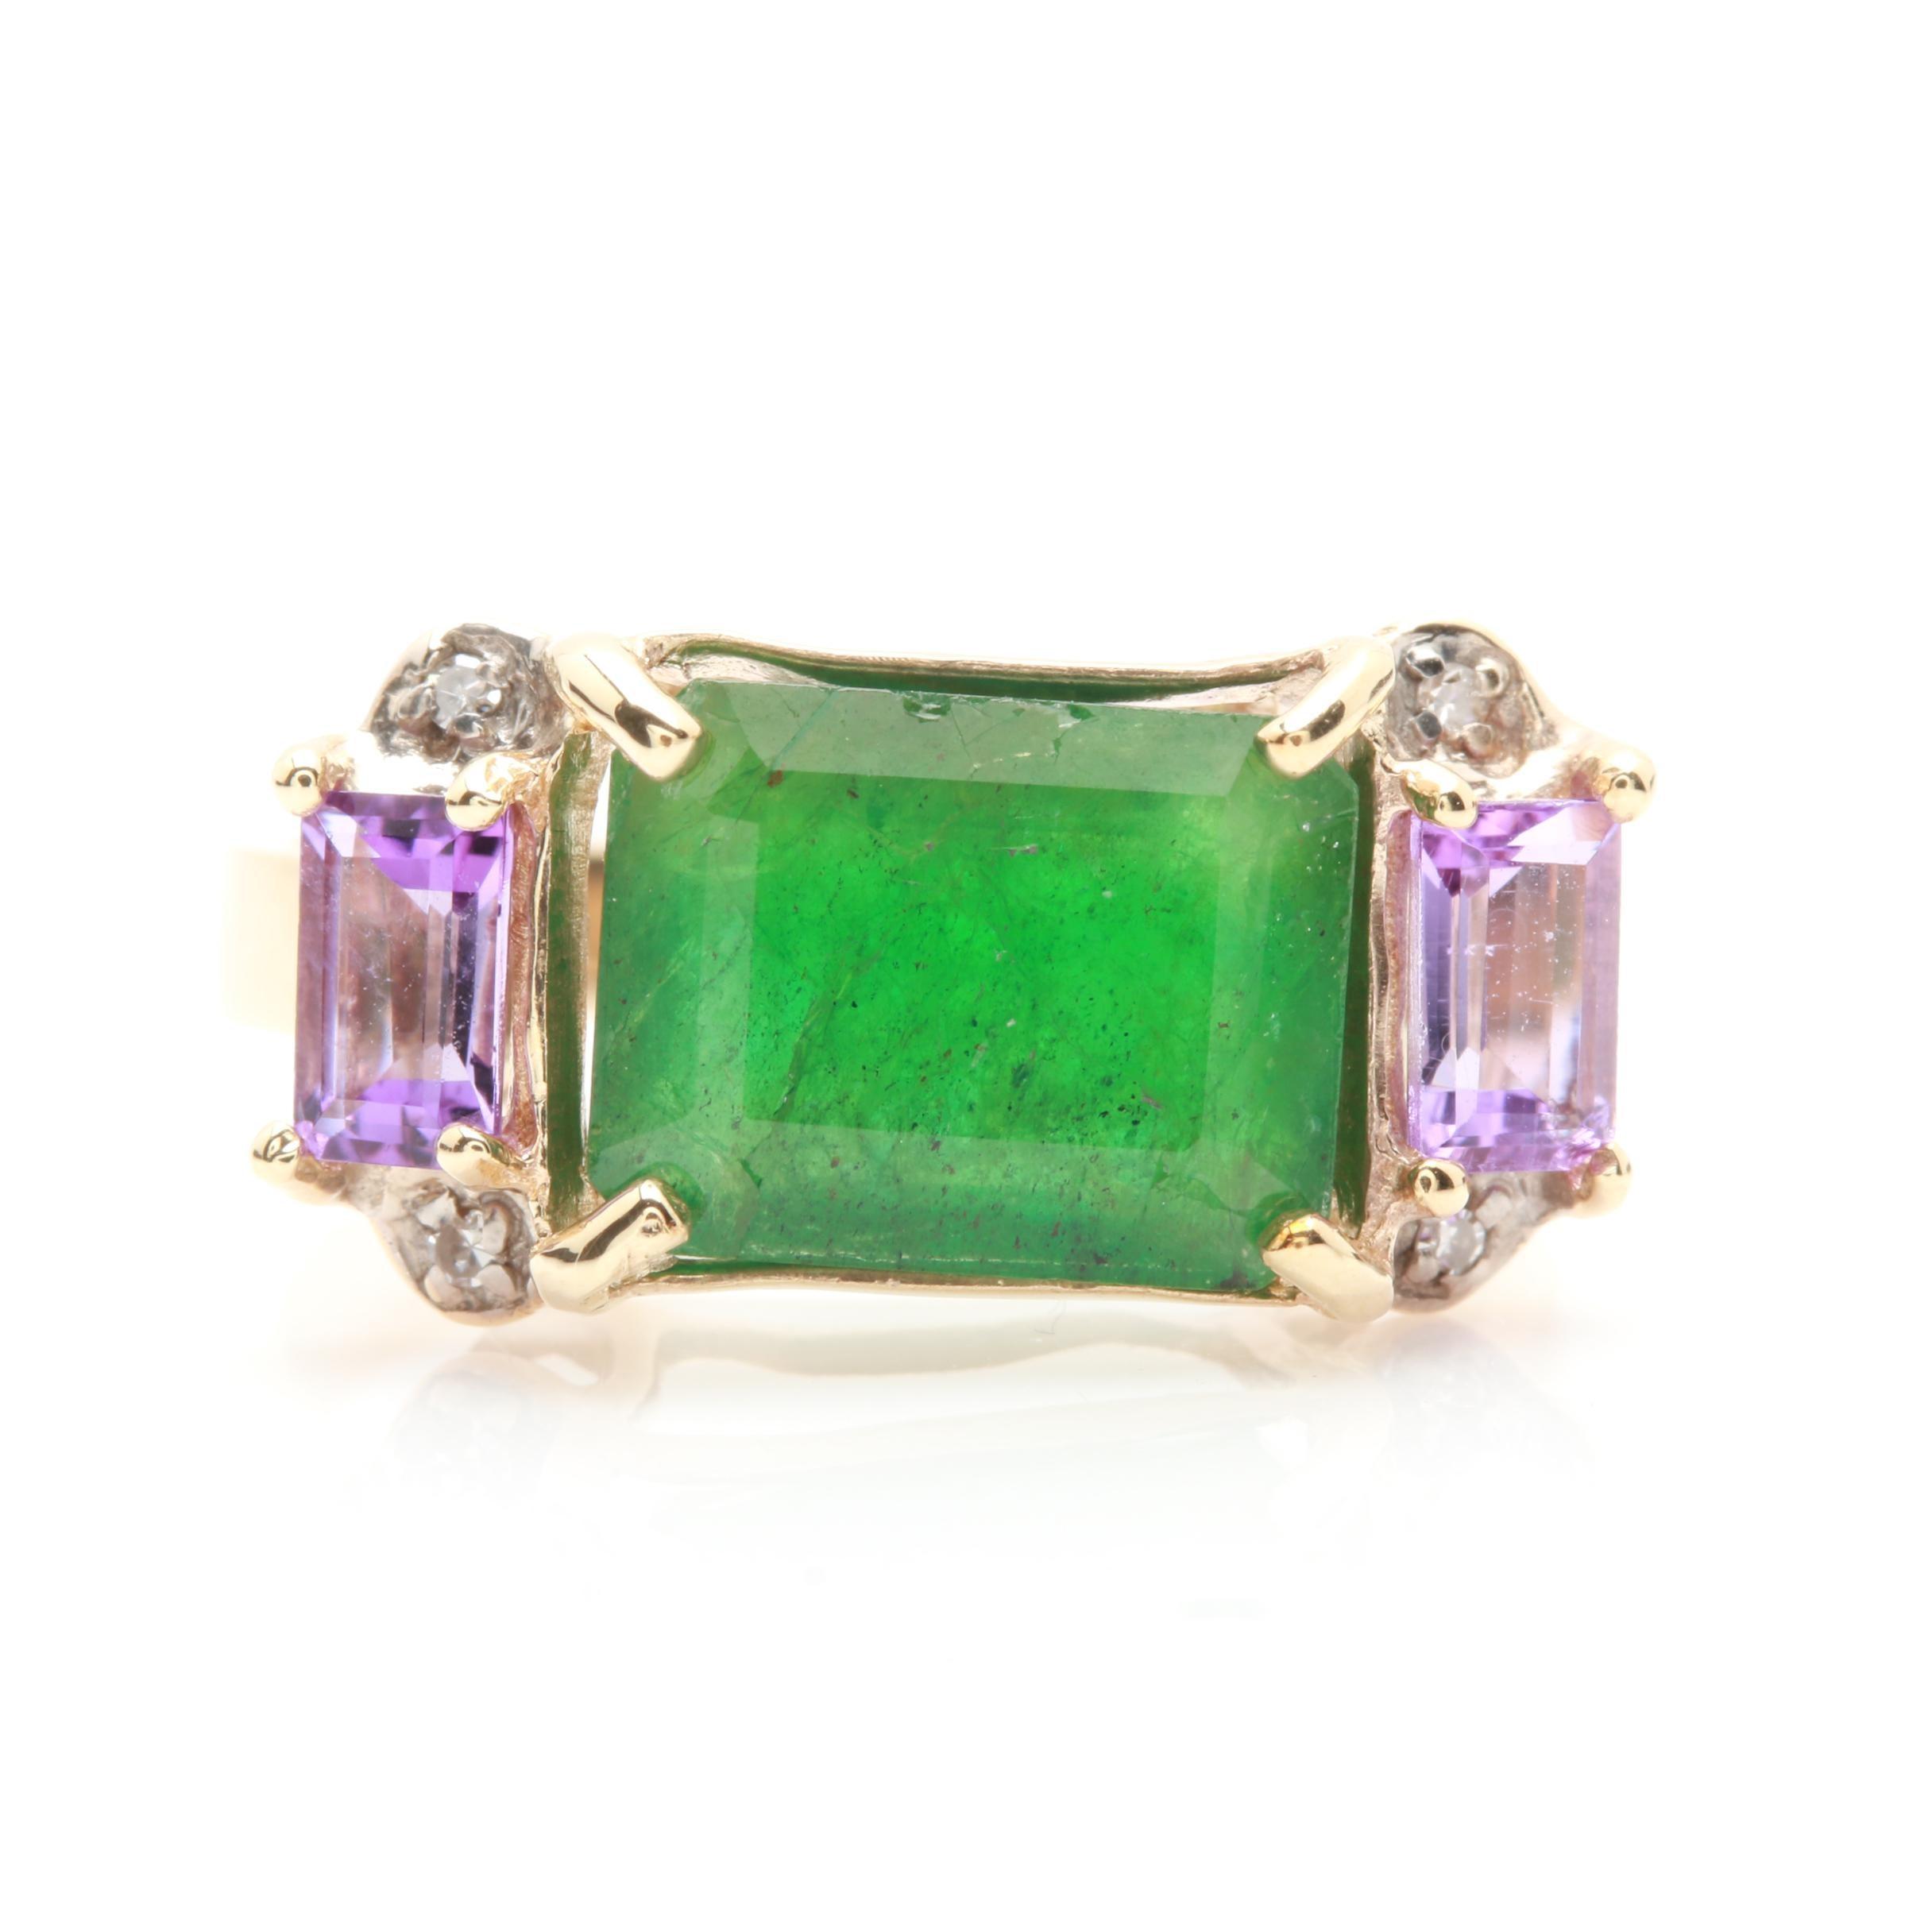 14K Yellow Gold 2.70 CT Emerald, Amethyst and Diamond Ring